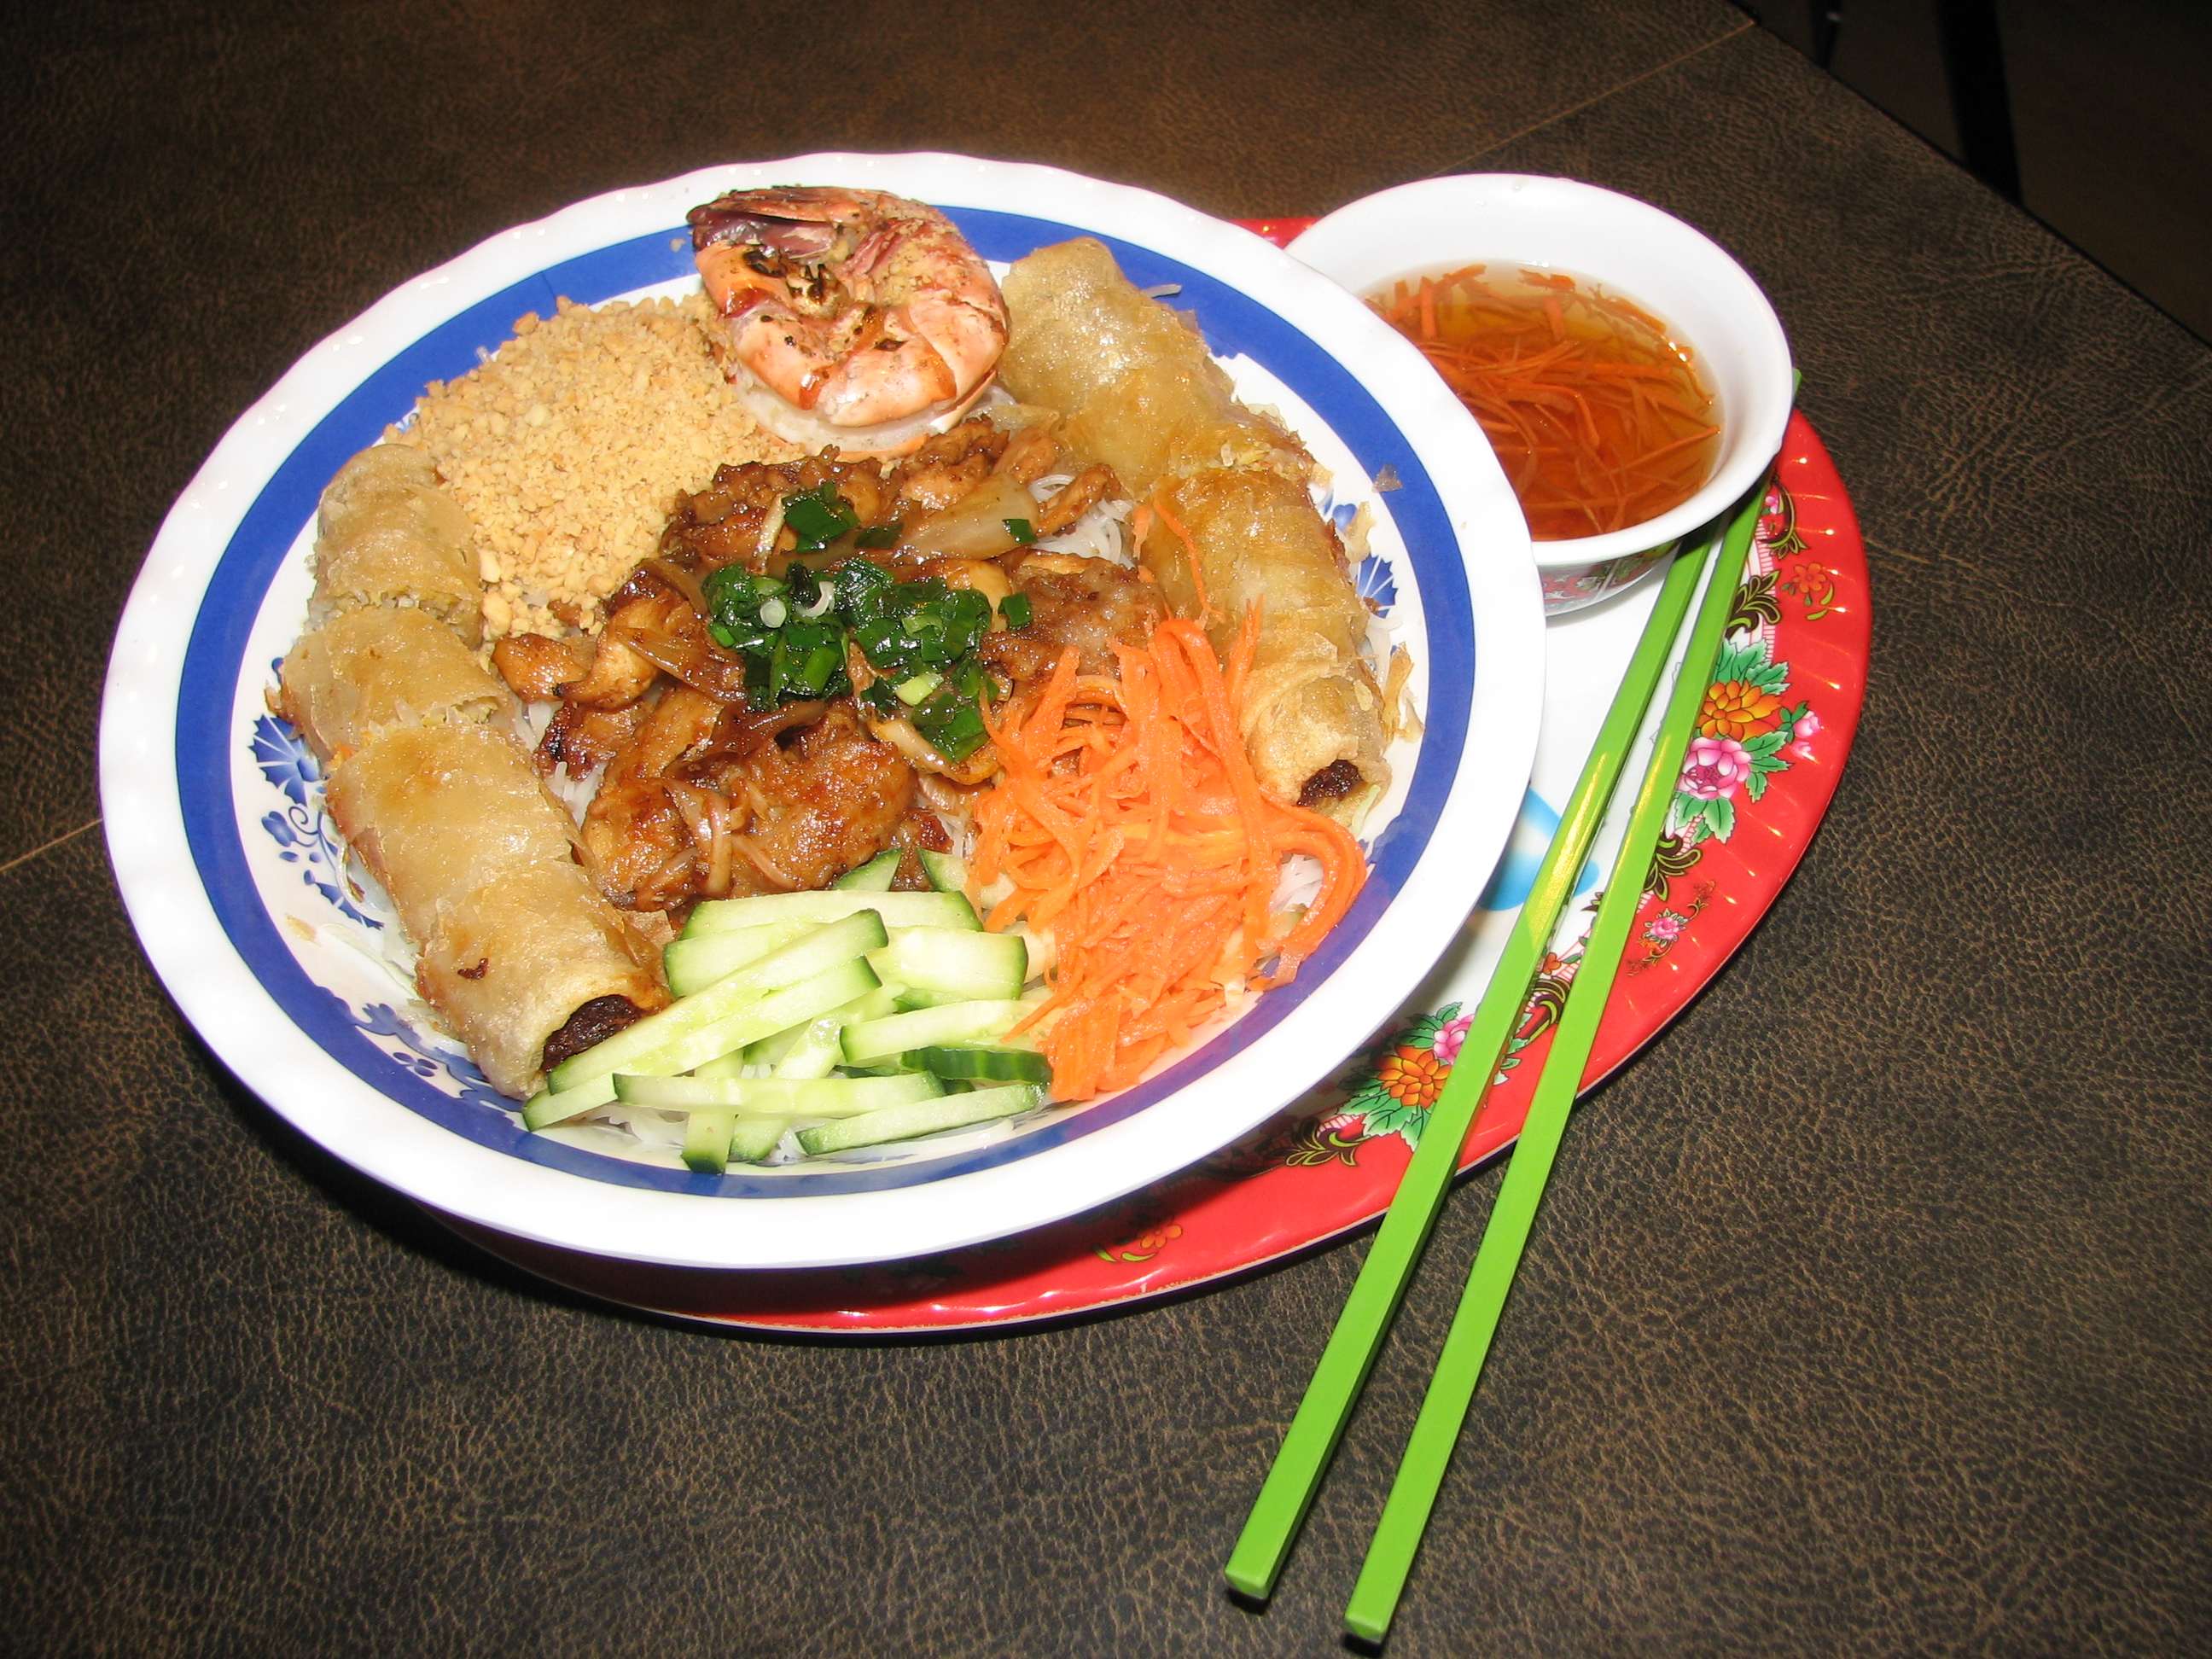 Spicy garden restaurant 1501 8th st e saskatoon for Asian cuisine saskatoon menu